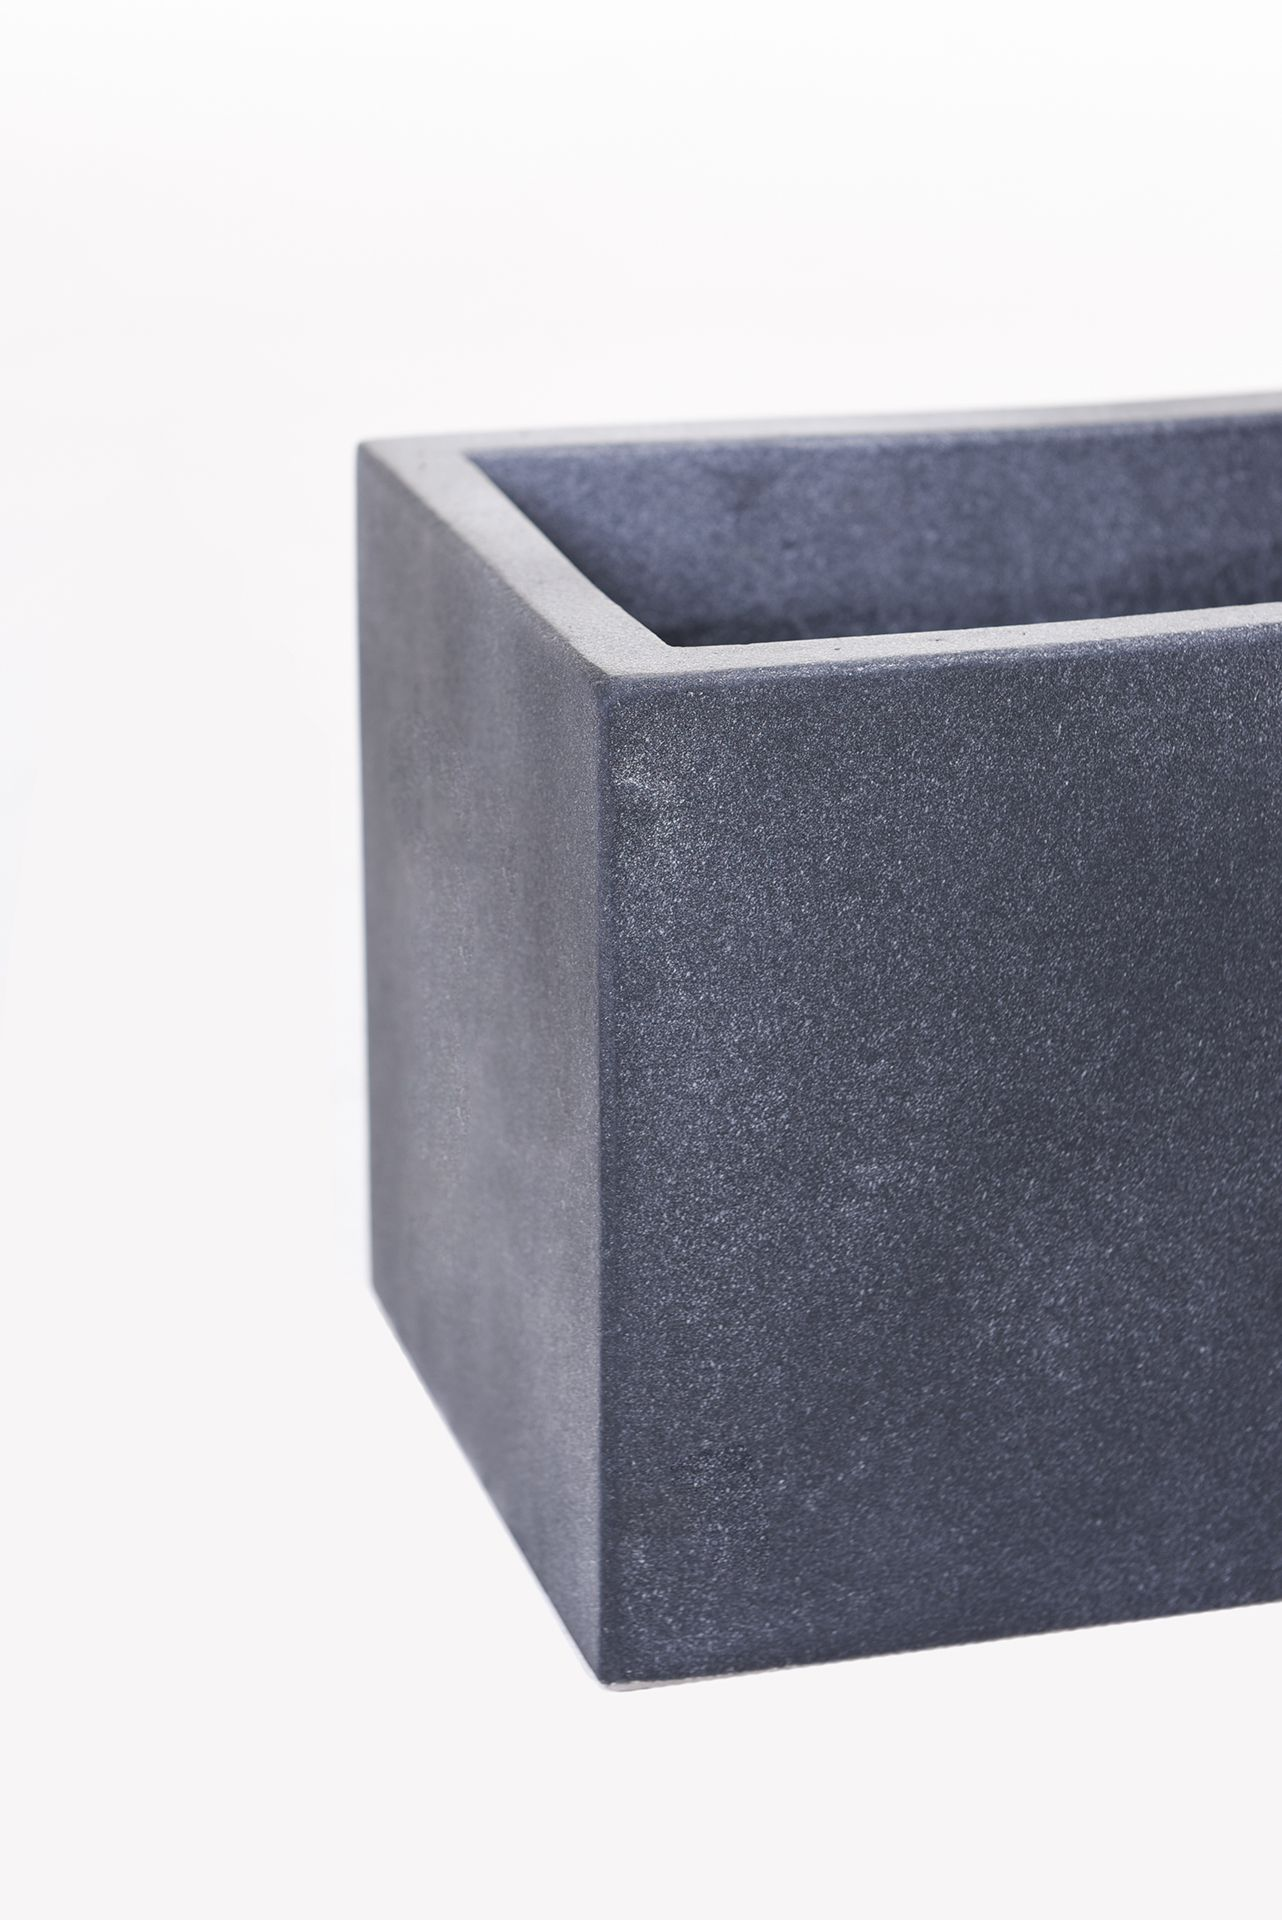 "blumenkasten balkonkasten pflanzkasten aus beton ""flobo"", 60 cm"